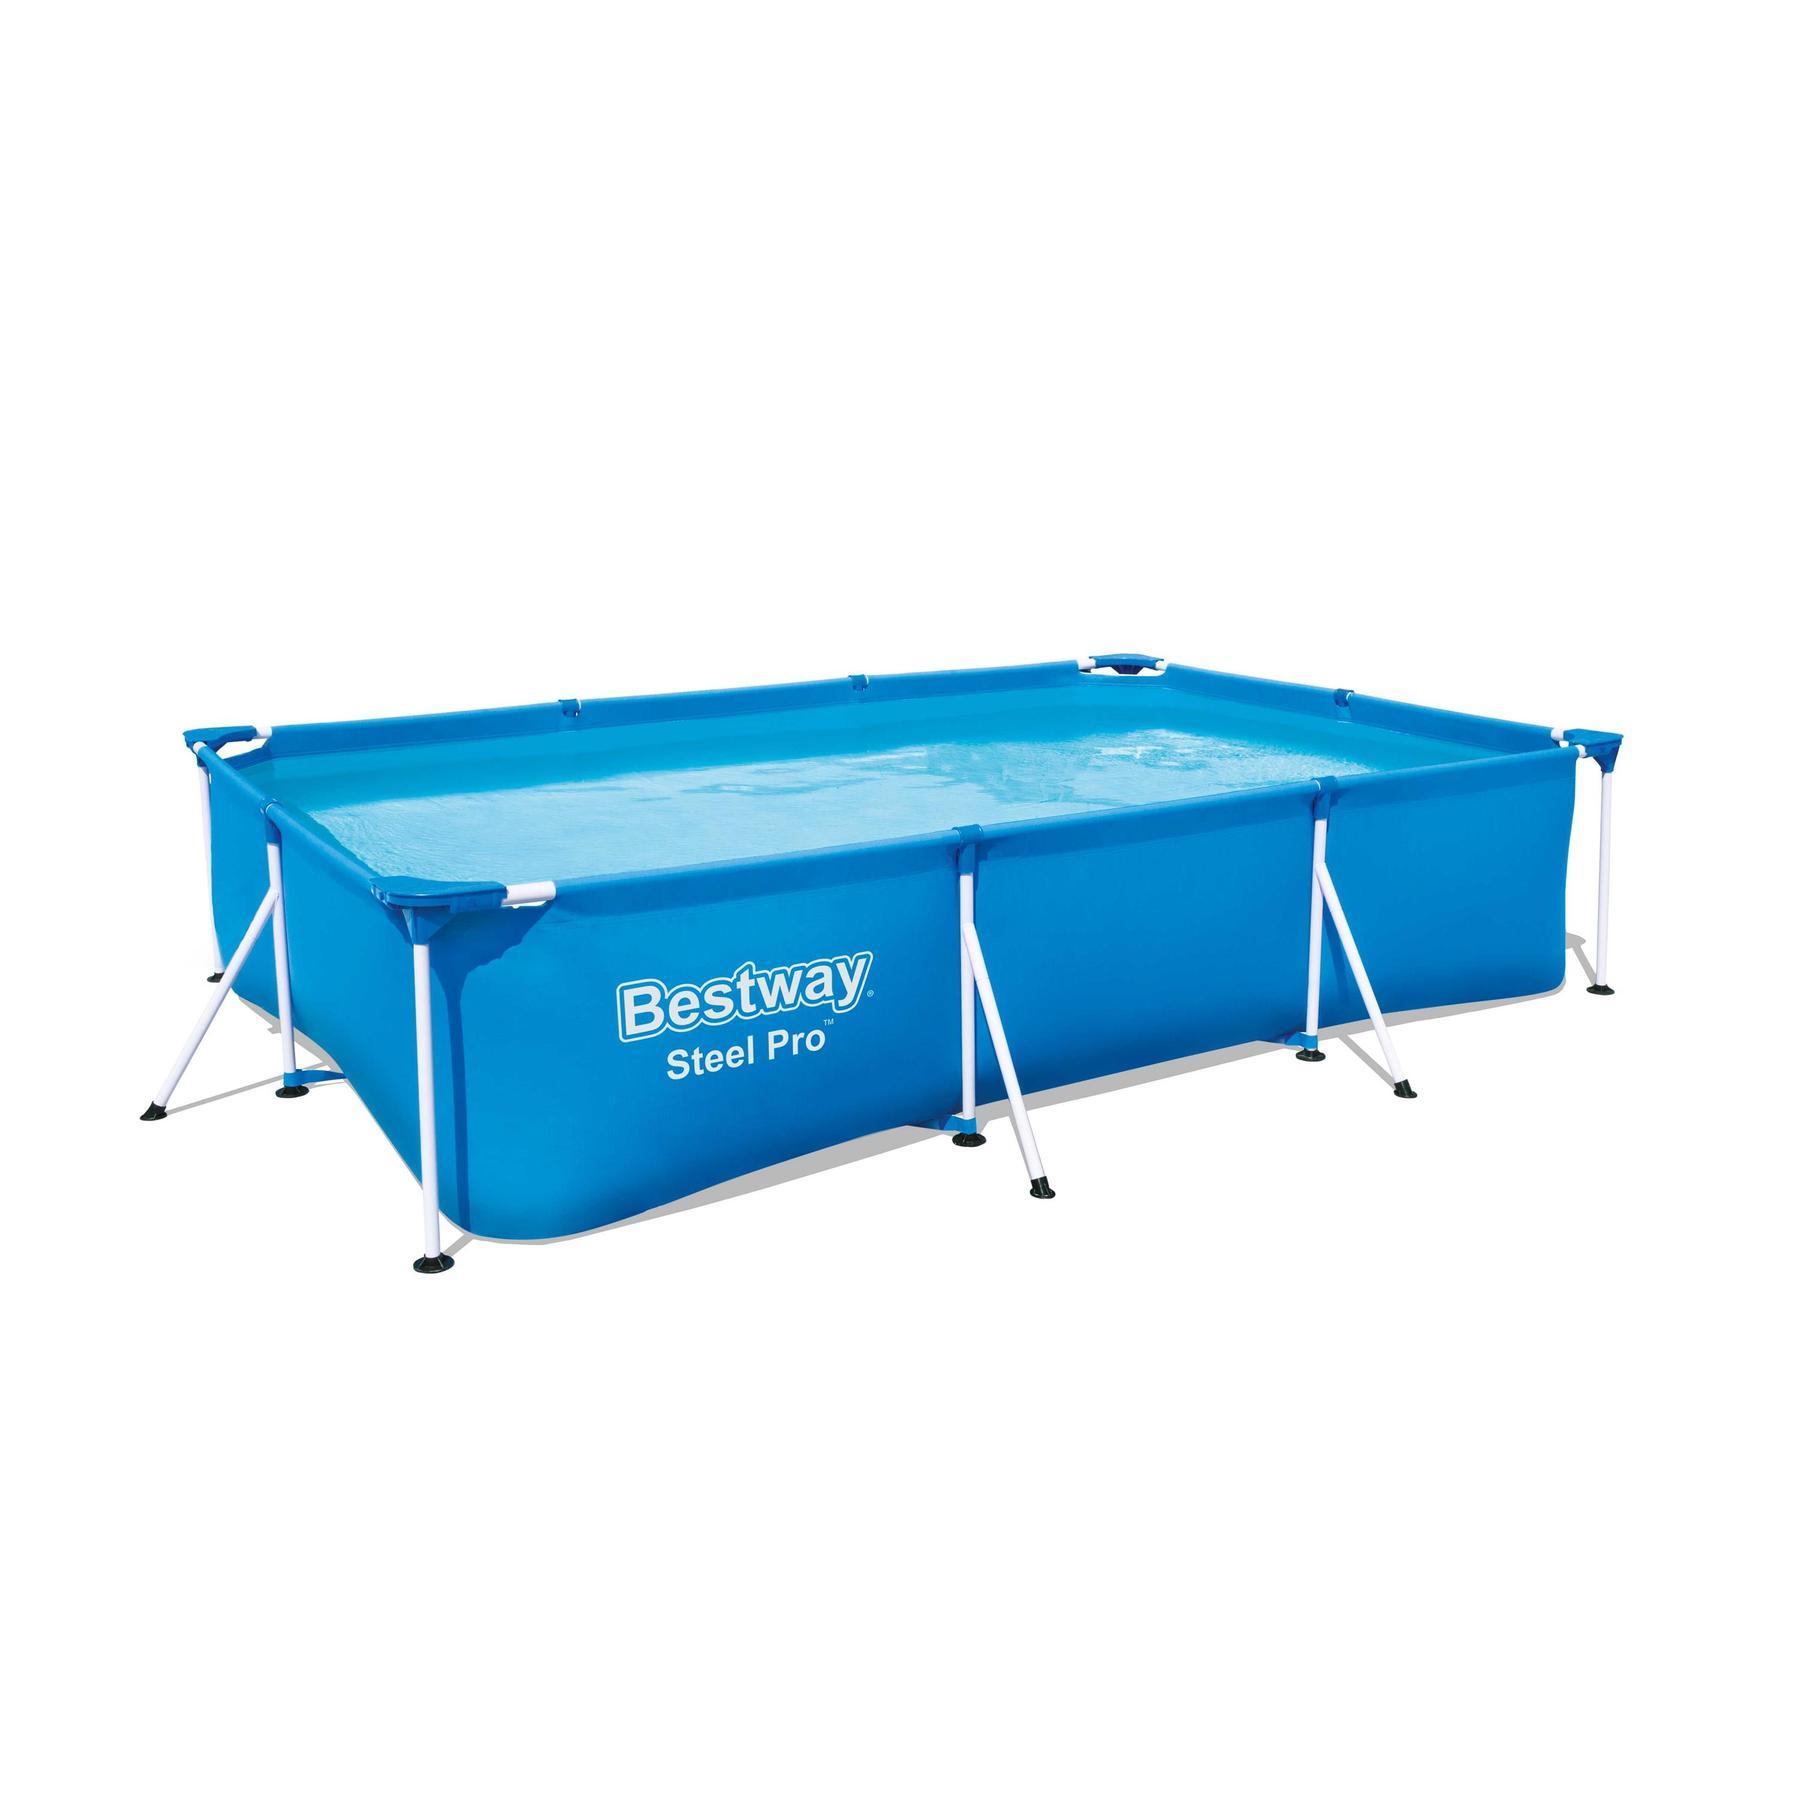 Scaffold Rectangular Pool 300 х201х66 Cm, 3300 L, Bestway Deluxe Splash, Item No. 56404